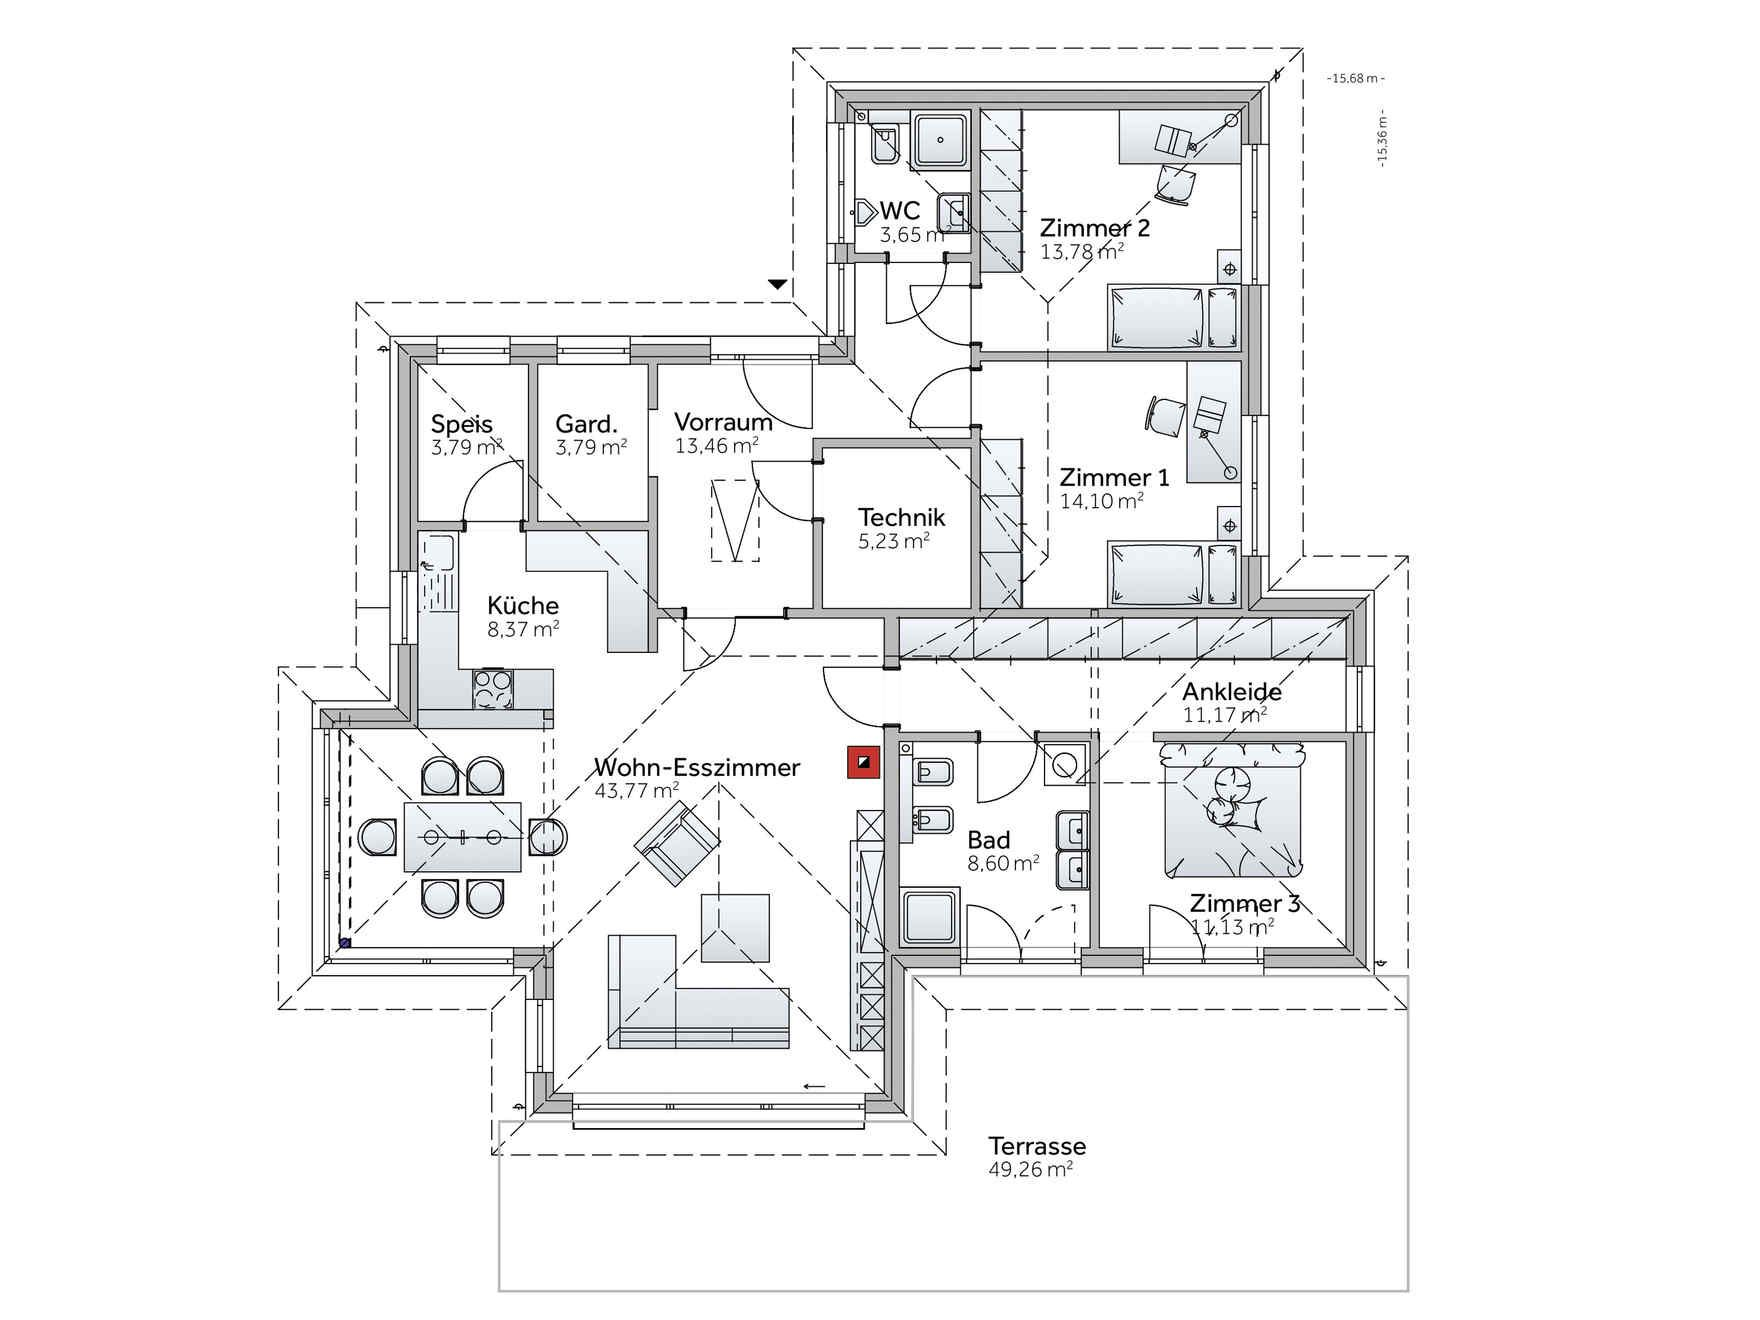 Fertighaus grundriss  Fertighaus Bungalow S141 | Architektur | Pinterest | Fertighaus ...